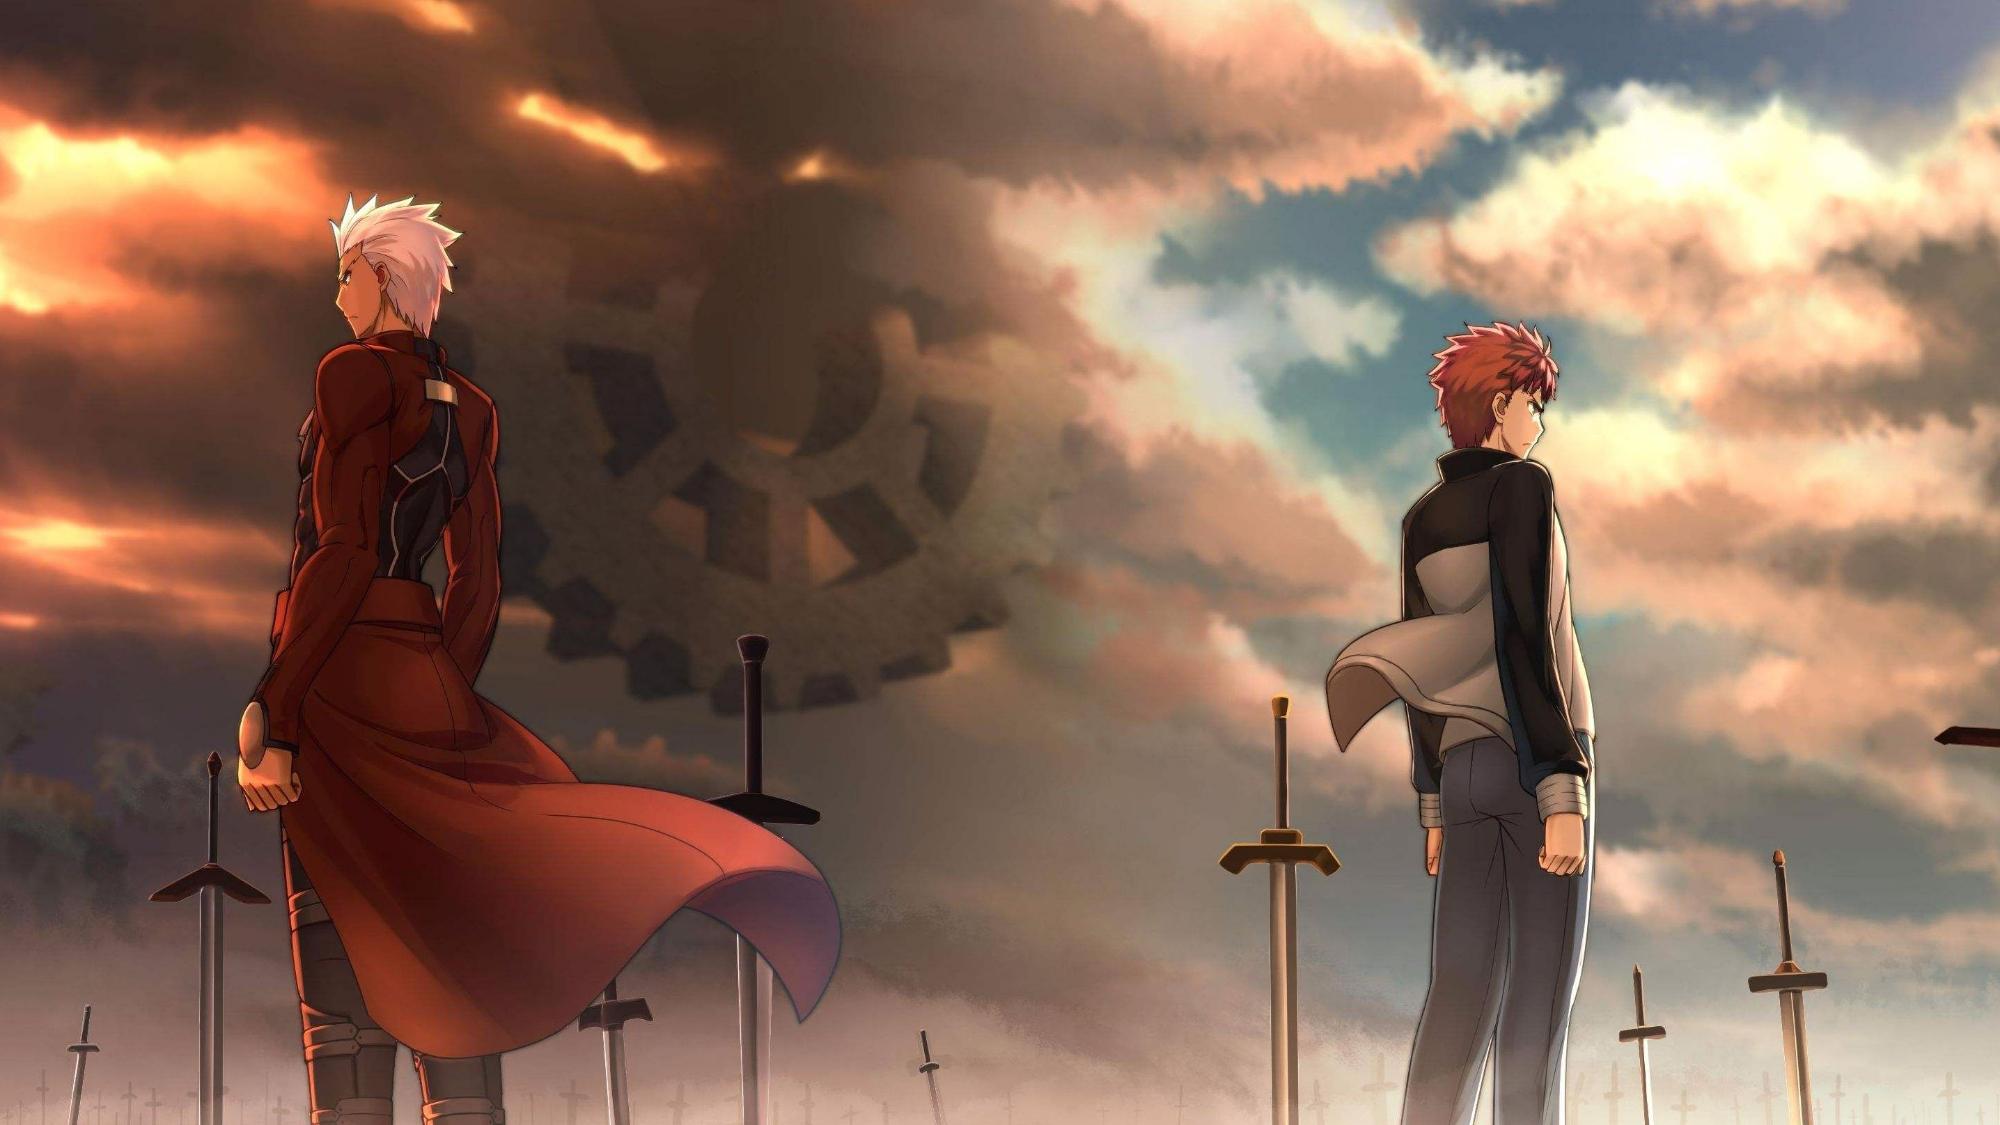 【Fate】坚持正义,捍卫理想——卫宫士郎